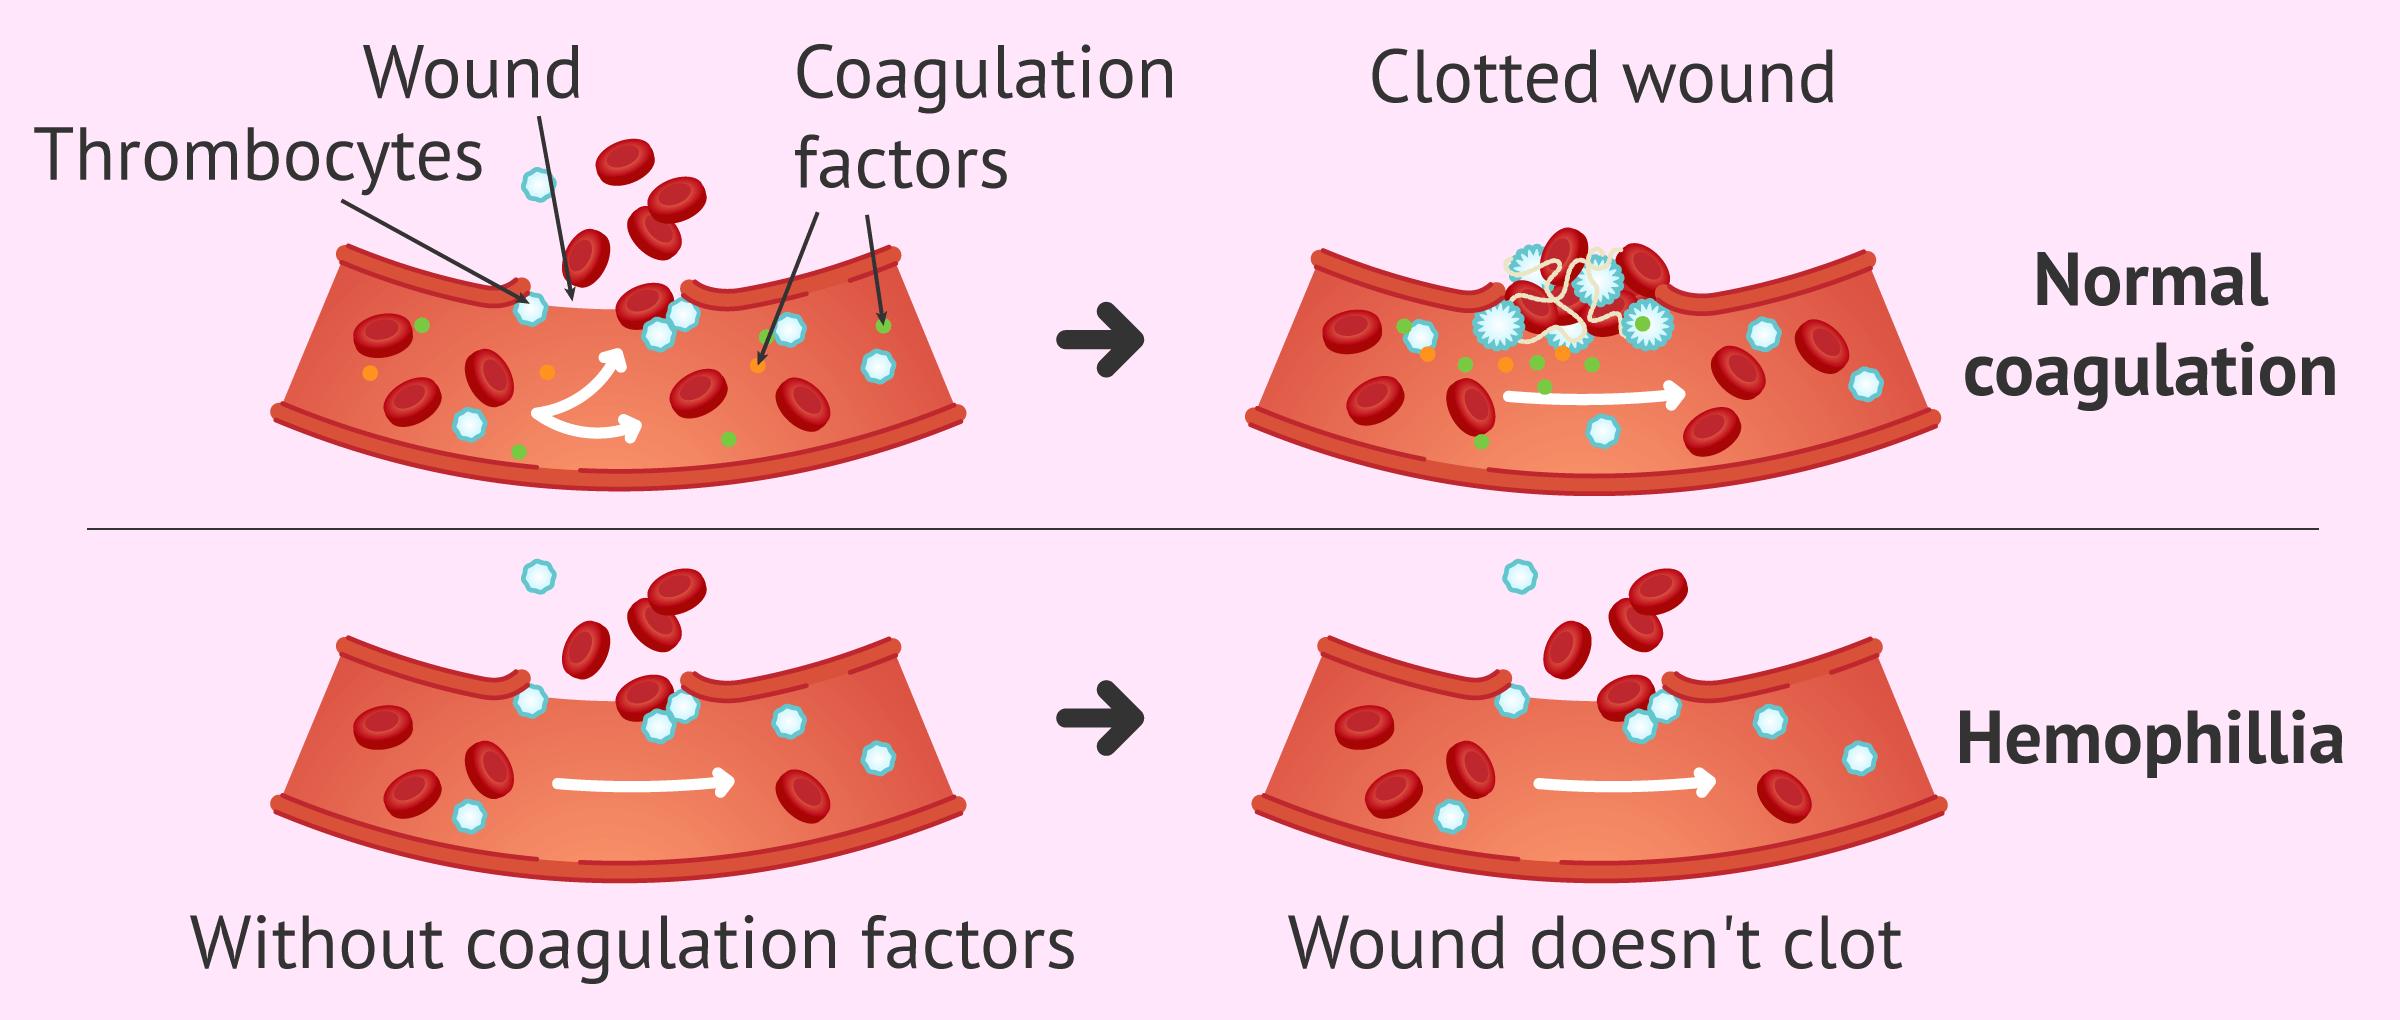 Clotting problems in hemophilia